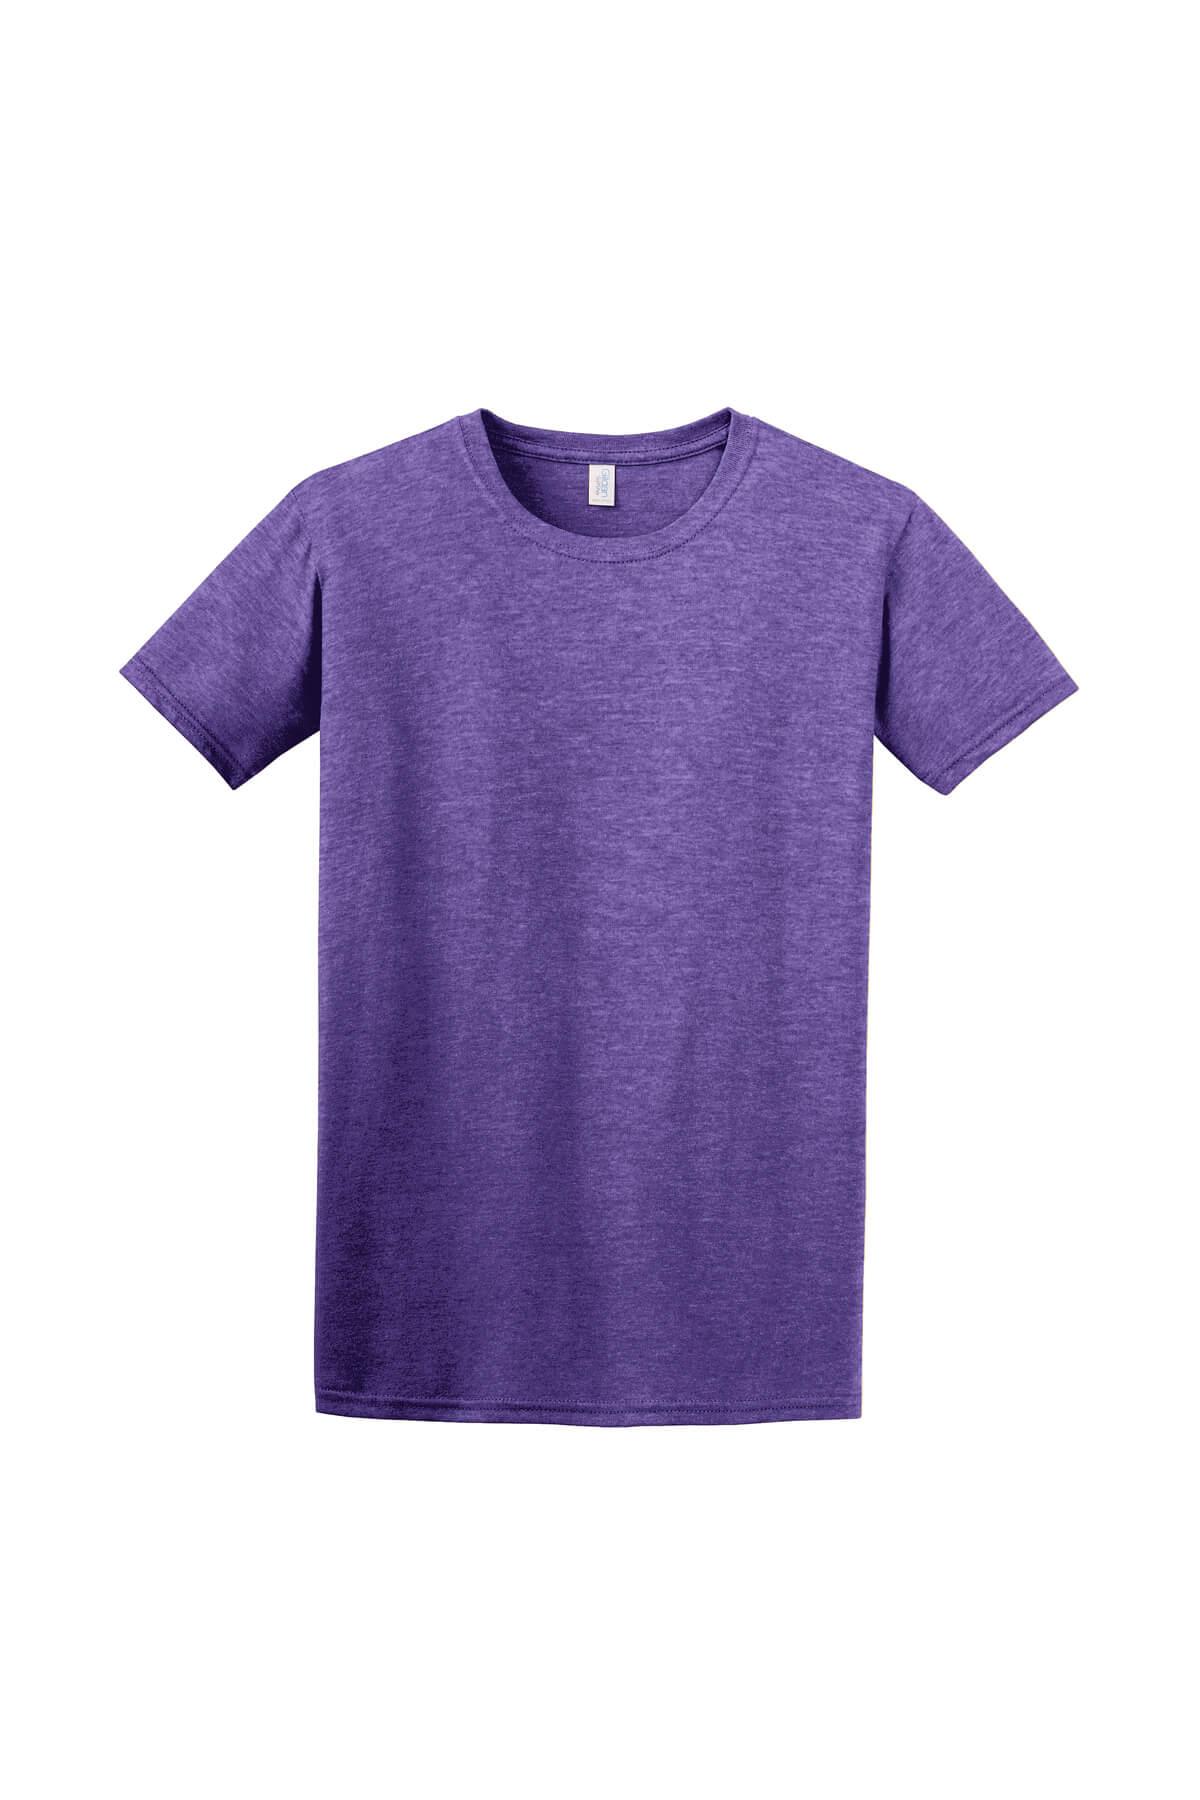 Heather Purple T-Shirt Front